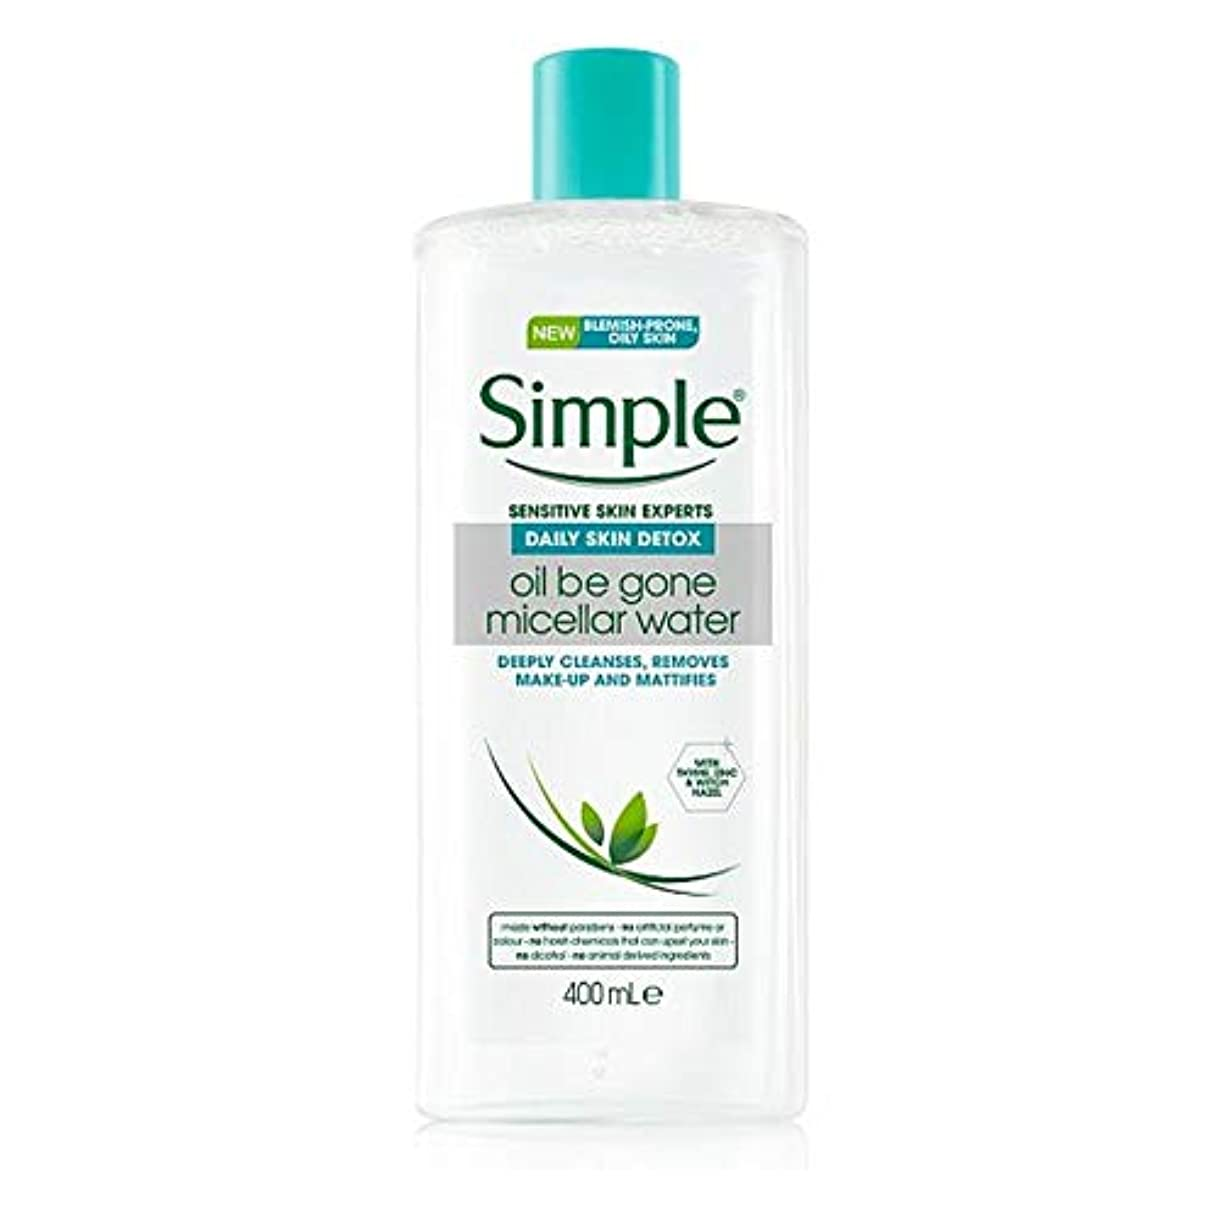 [Simple] シンプルOilbegoneミセルの水の肌面400ミリリットル - Simple Oilbegone Micellar Water Skin Face 400 Ml [並行輸入品]